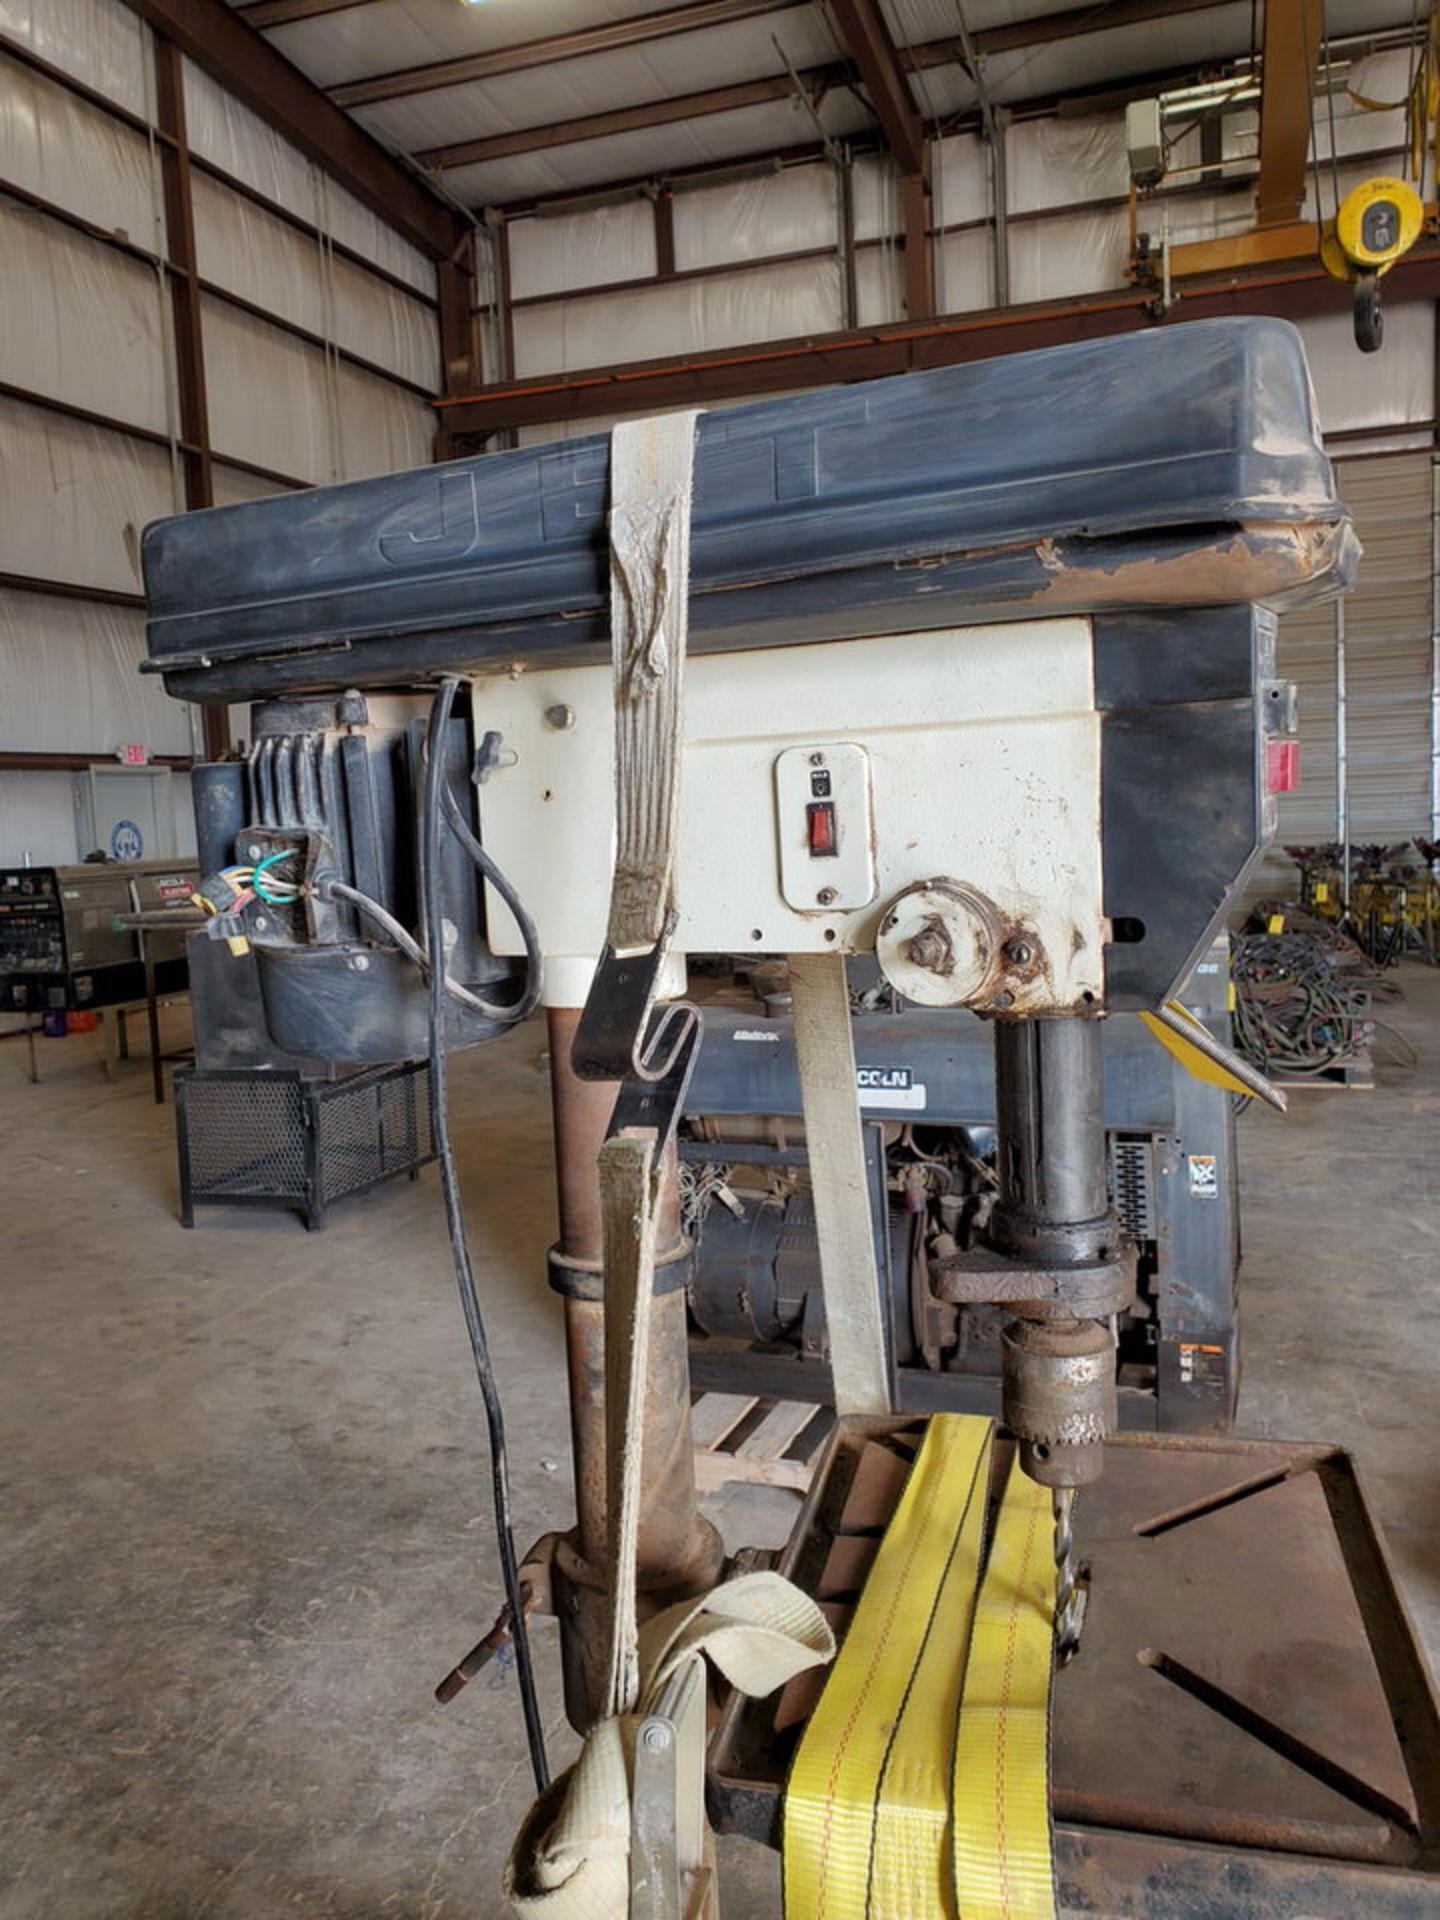 "JDP-20MF 20"" Drill Press 115/230V, 1-1/2HP, 1720RPM, 1"" Drilling Cap.; 16"" x 18"" Work Table - Image 5 of 8"